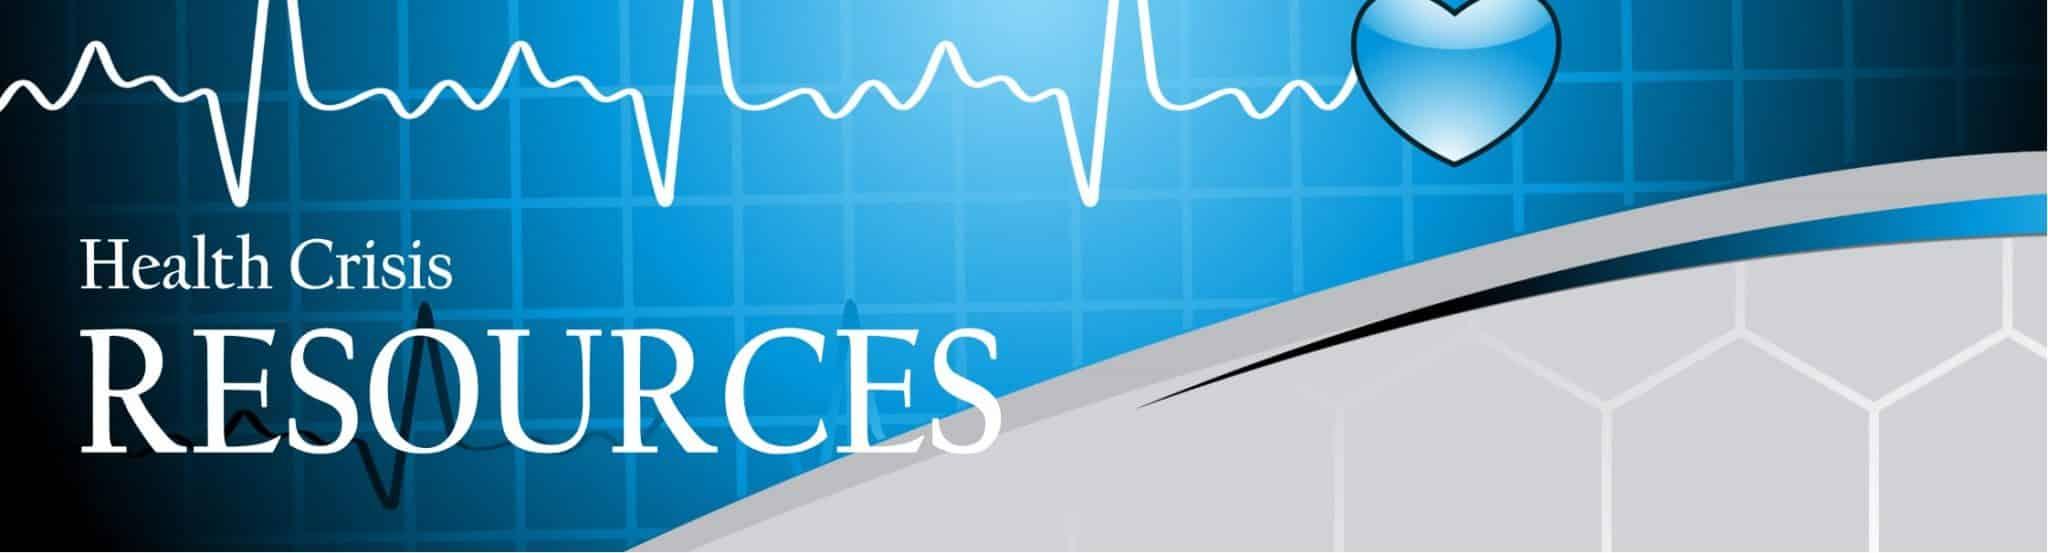 Health Crisis Resources